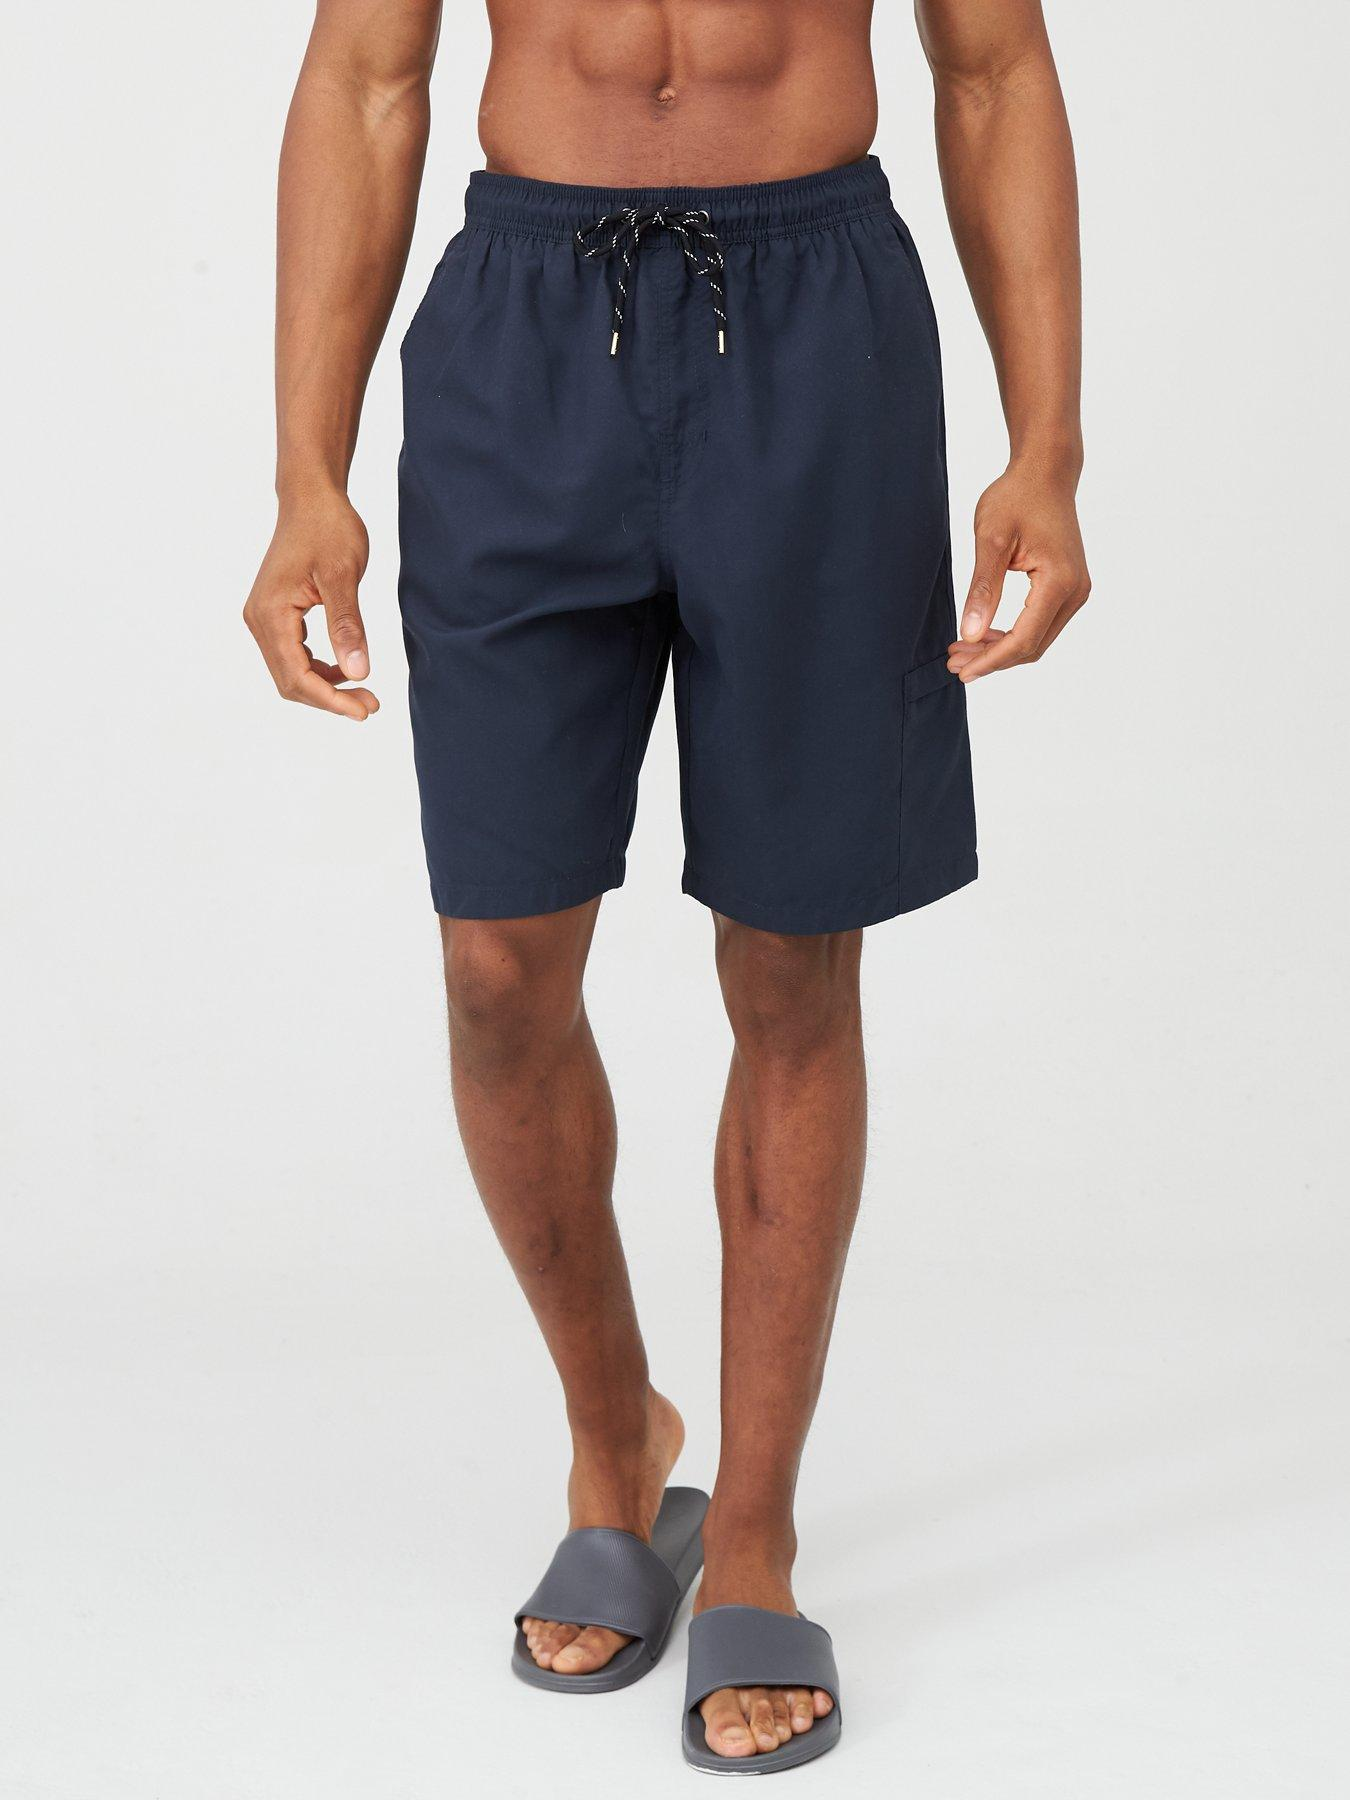 Horizon-t Beach Shorts Paisley Mens Fashion Quick Dry Beach Shorts Cool Casual Beach Shorts